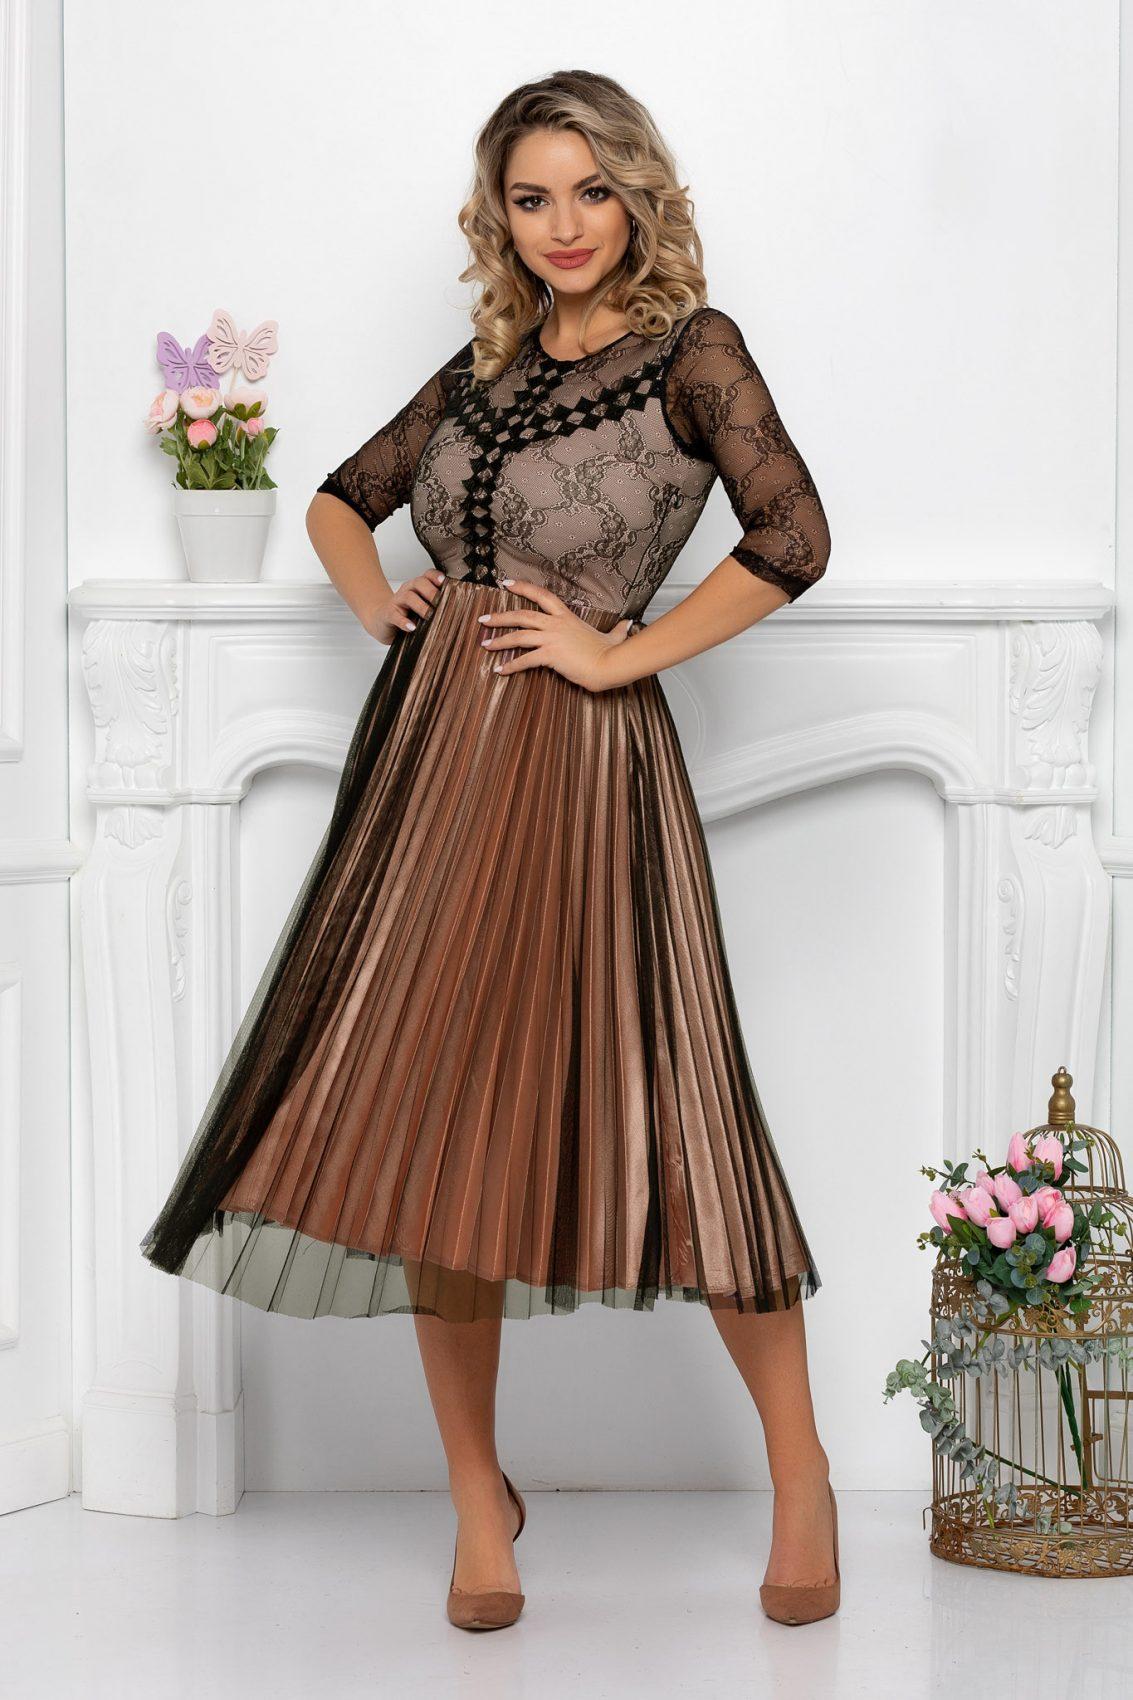 Nude Μίντι Πλισέ Φόρεμα Romance 9490 1